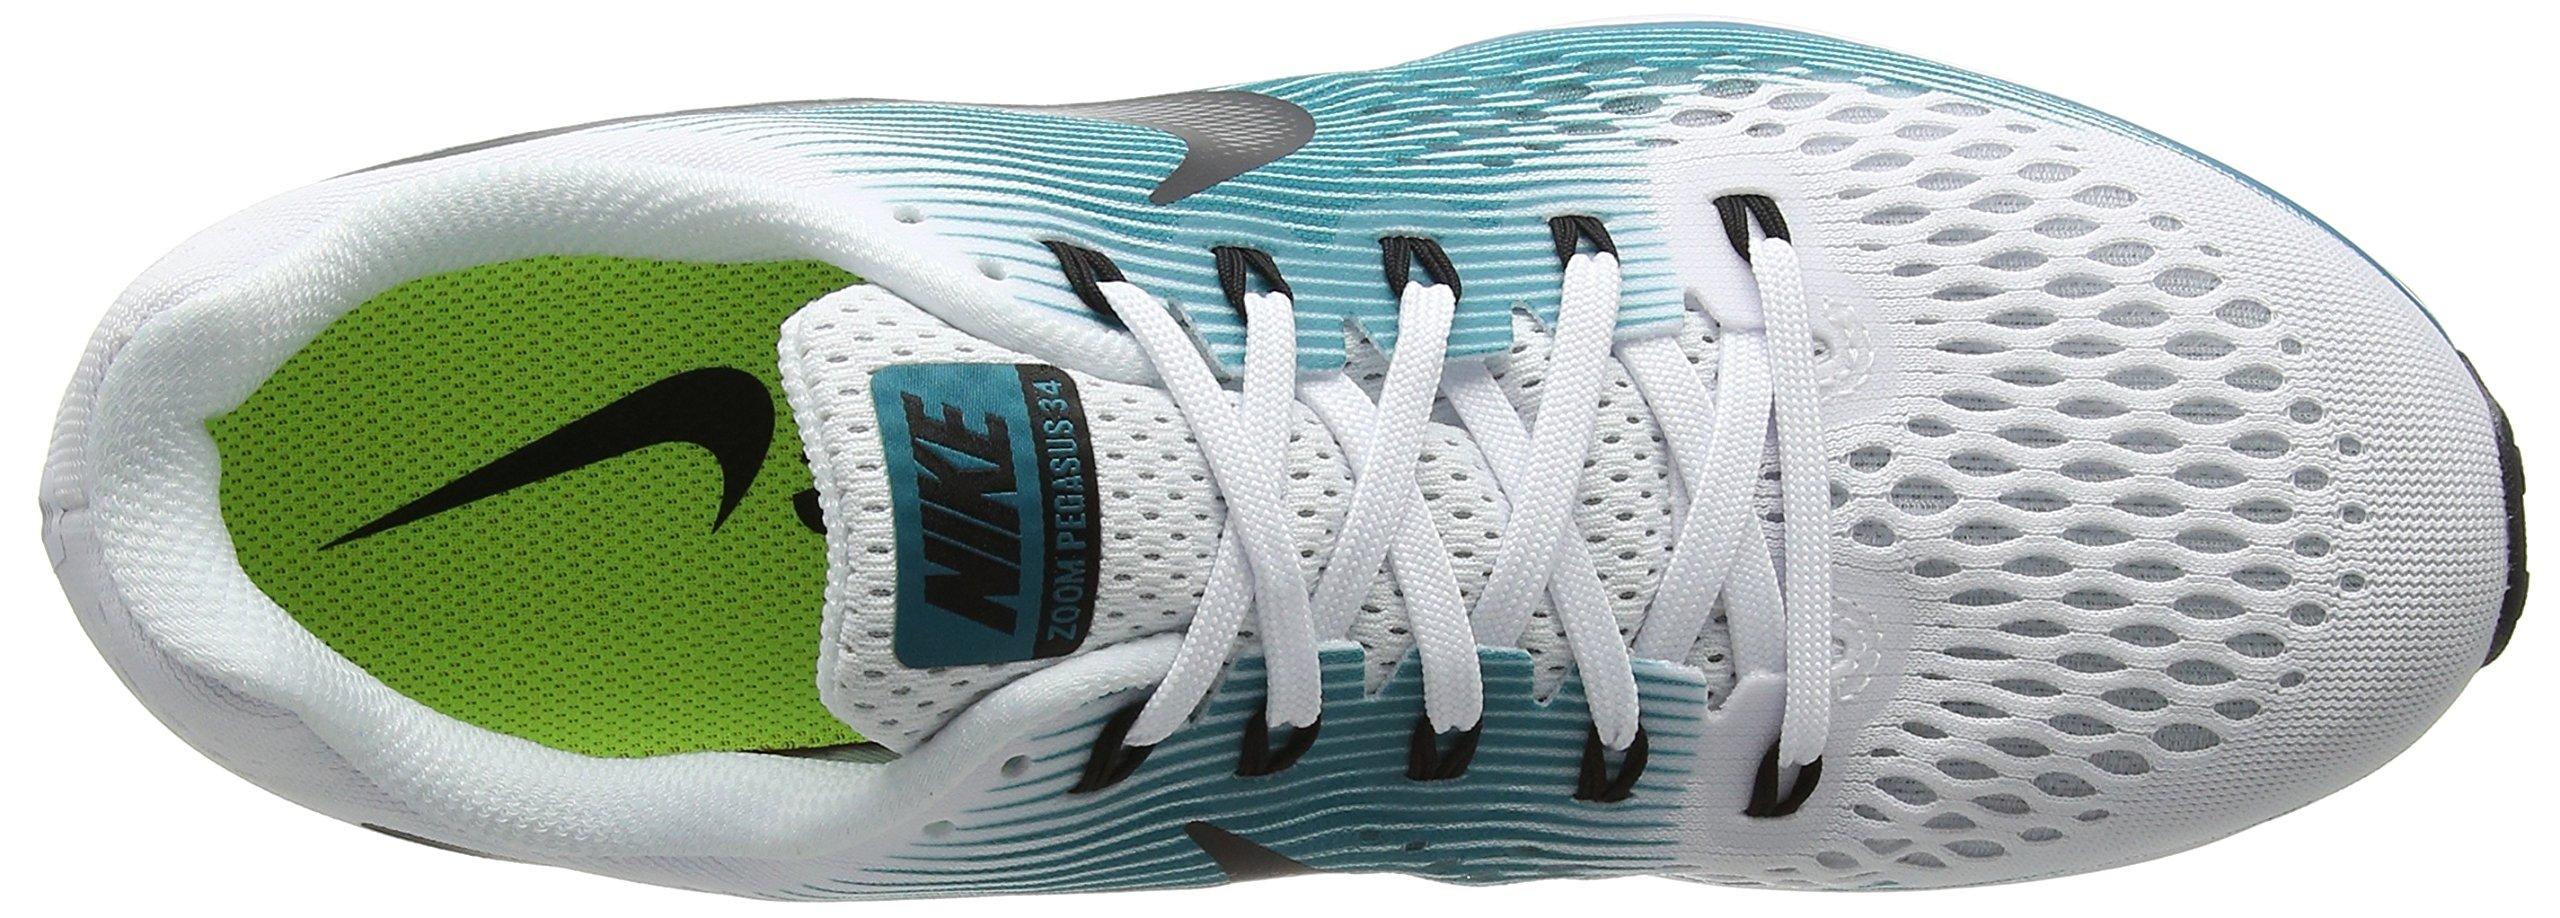 Nike Men's Air Zoom Pegasus 34 White / Black - Blustery 880555-101 (11.5) by NIKE (Image #7)